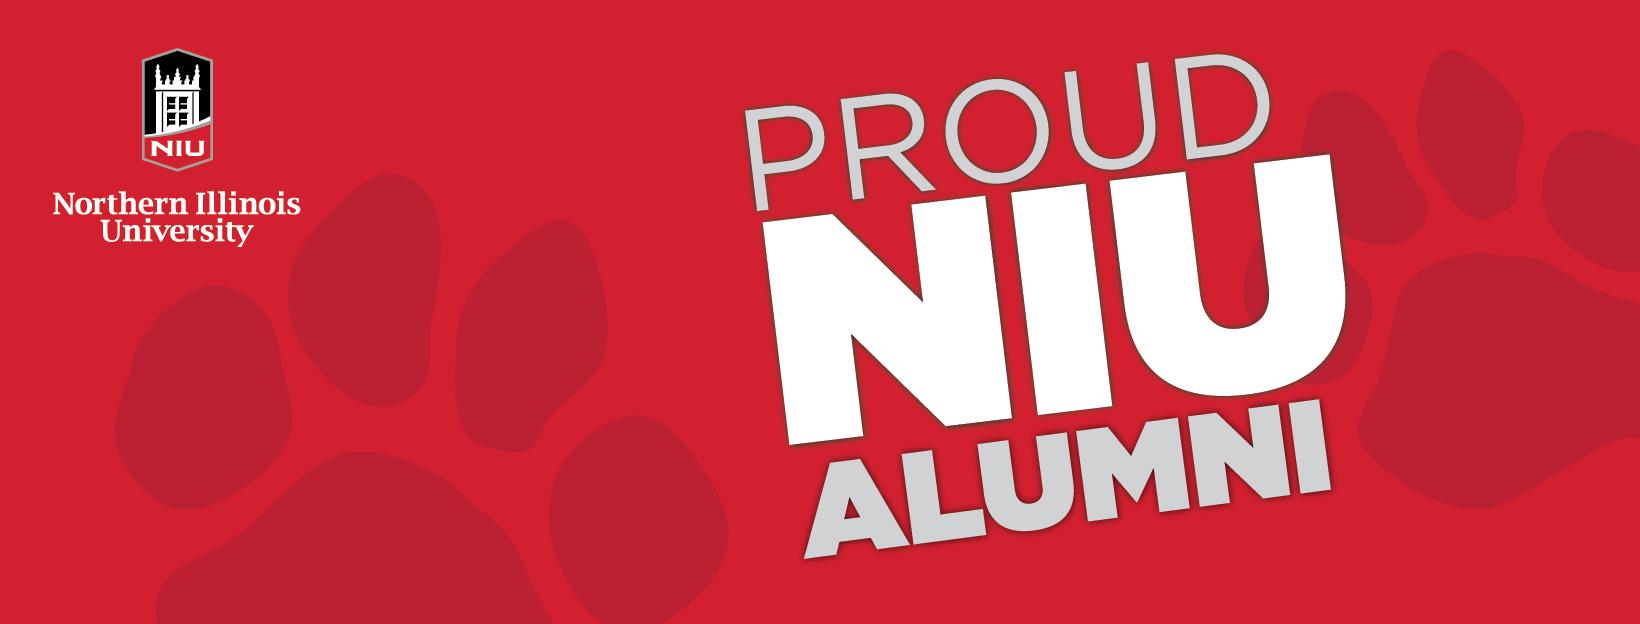 Proud Huskie Alumni - Red for Profile